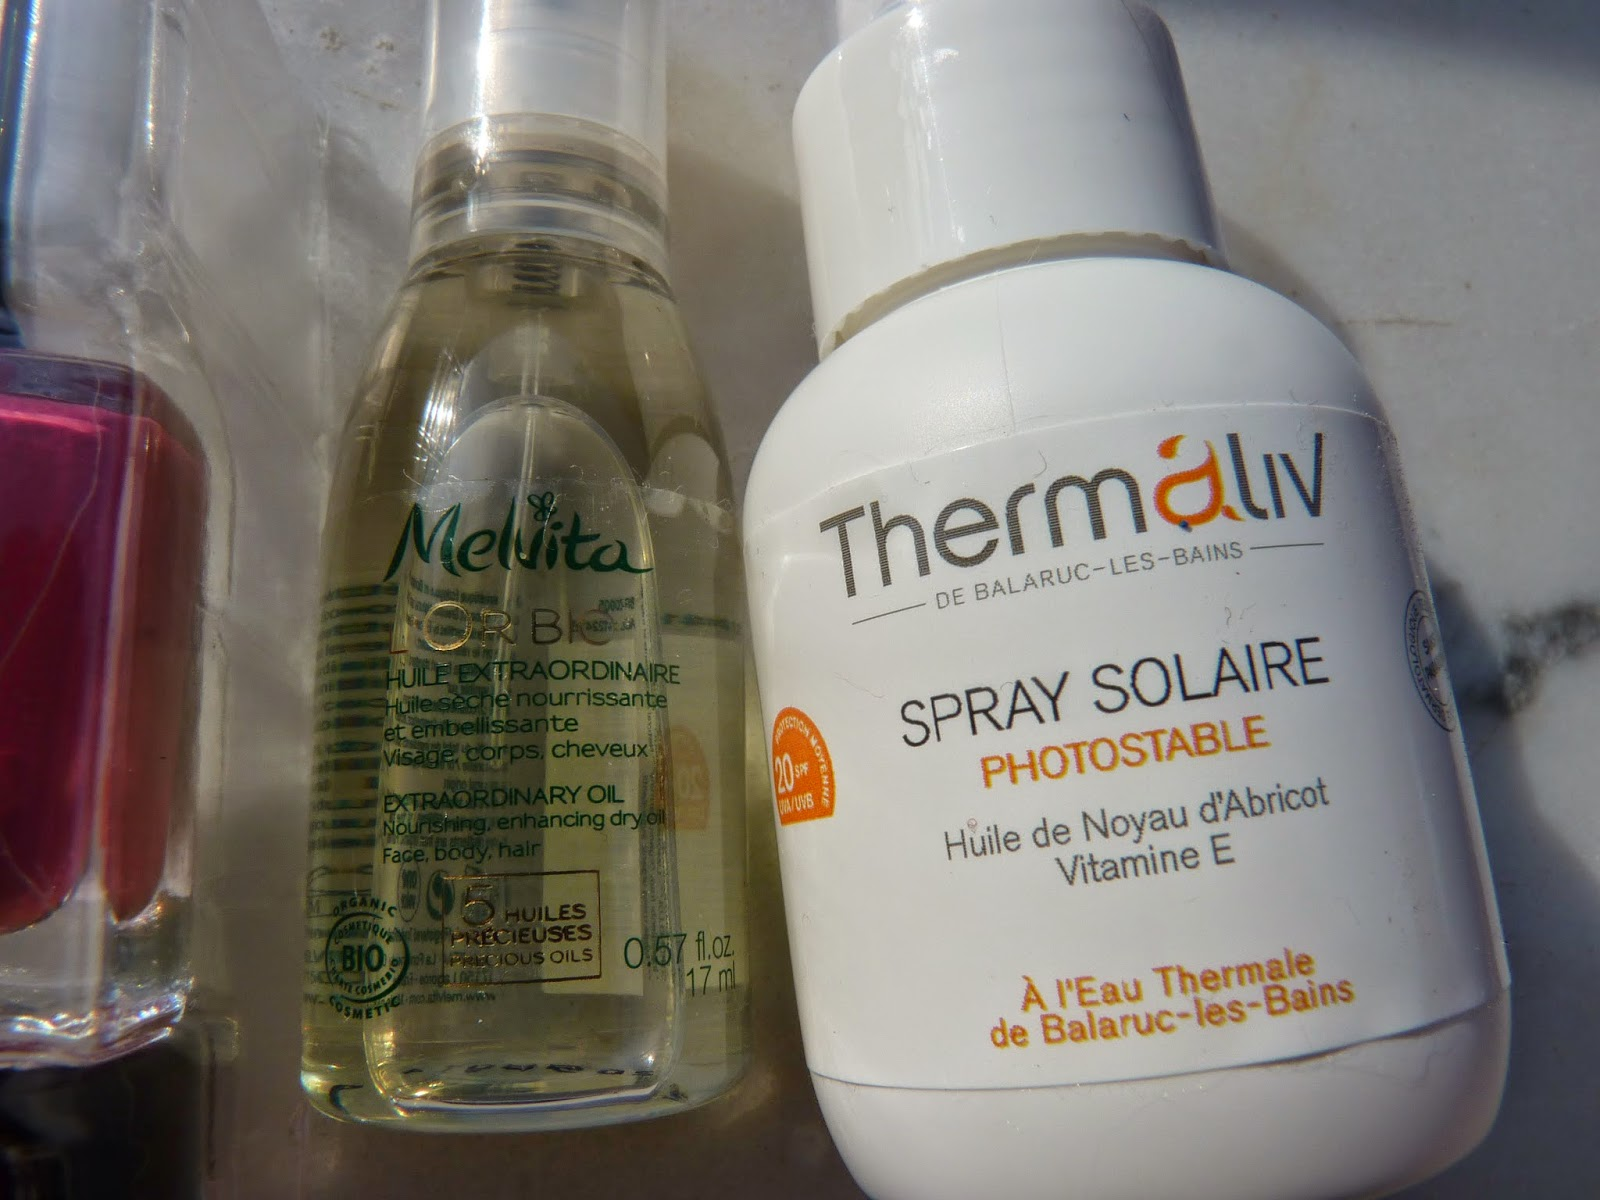 birchbox juin 2014, melvita, huile sèche, tout usage, protecteur solaire, spray, SPF 20, +, spray solaire, Thermaliv